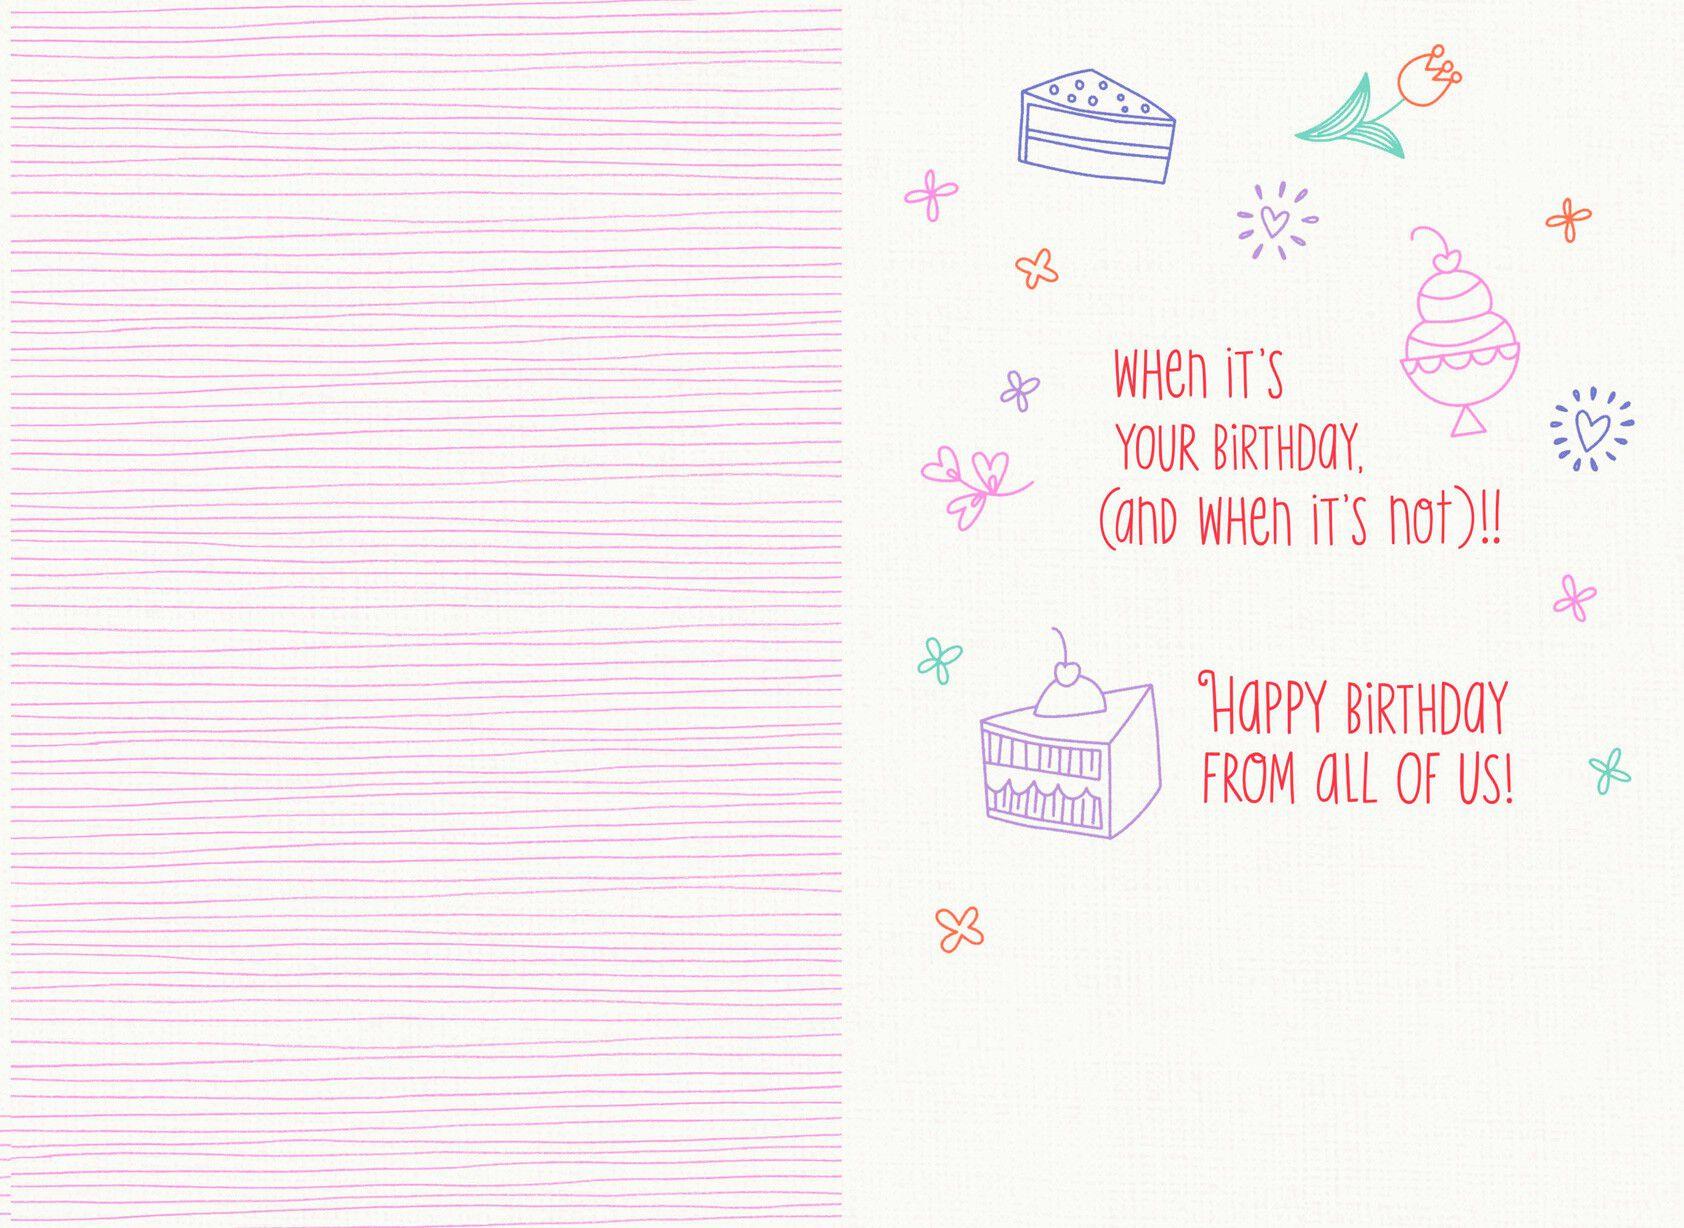 Happy Birthday Godmother Card: Birds In A Tree Happy Birthday Card For Godmother